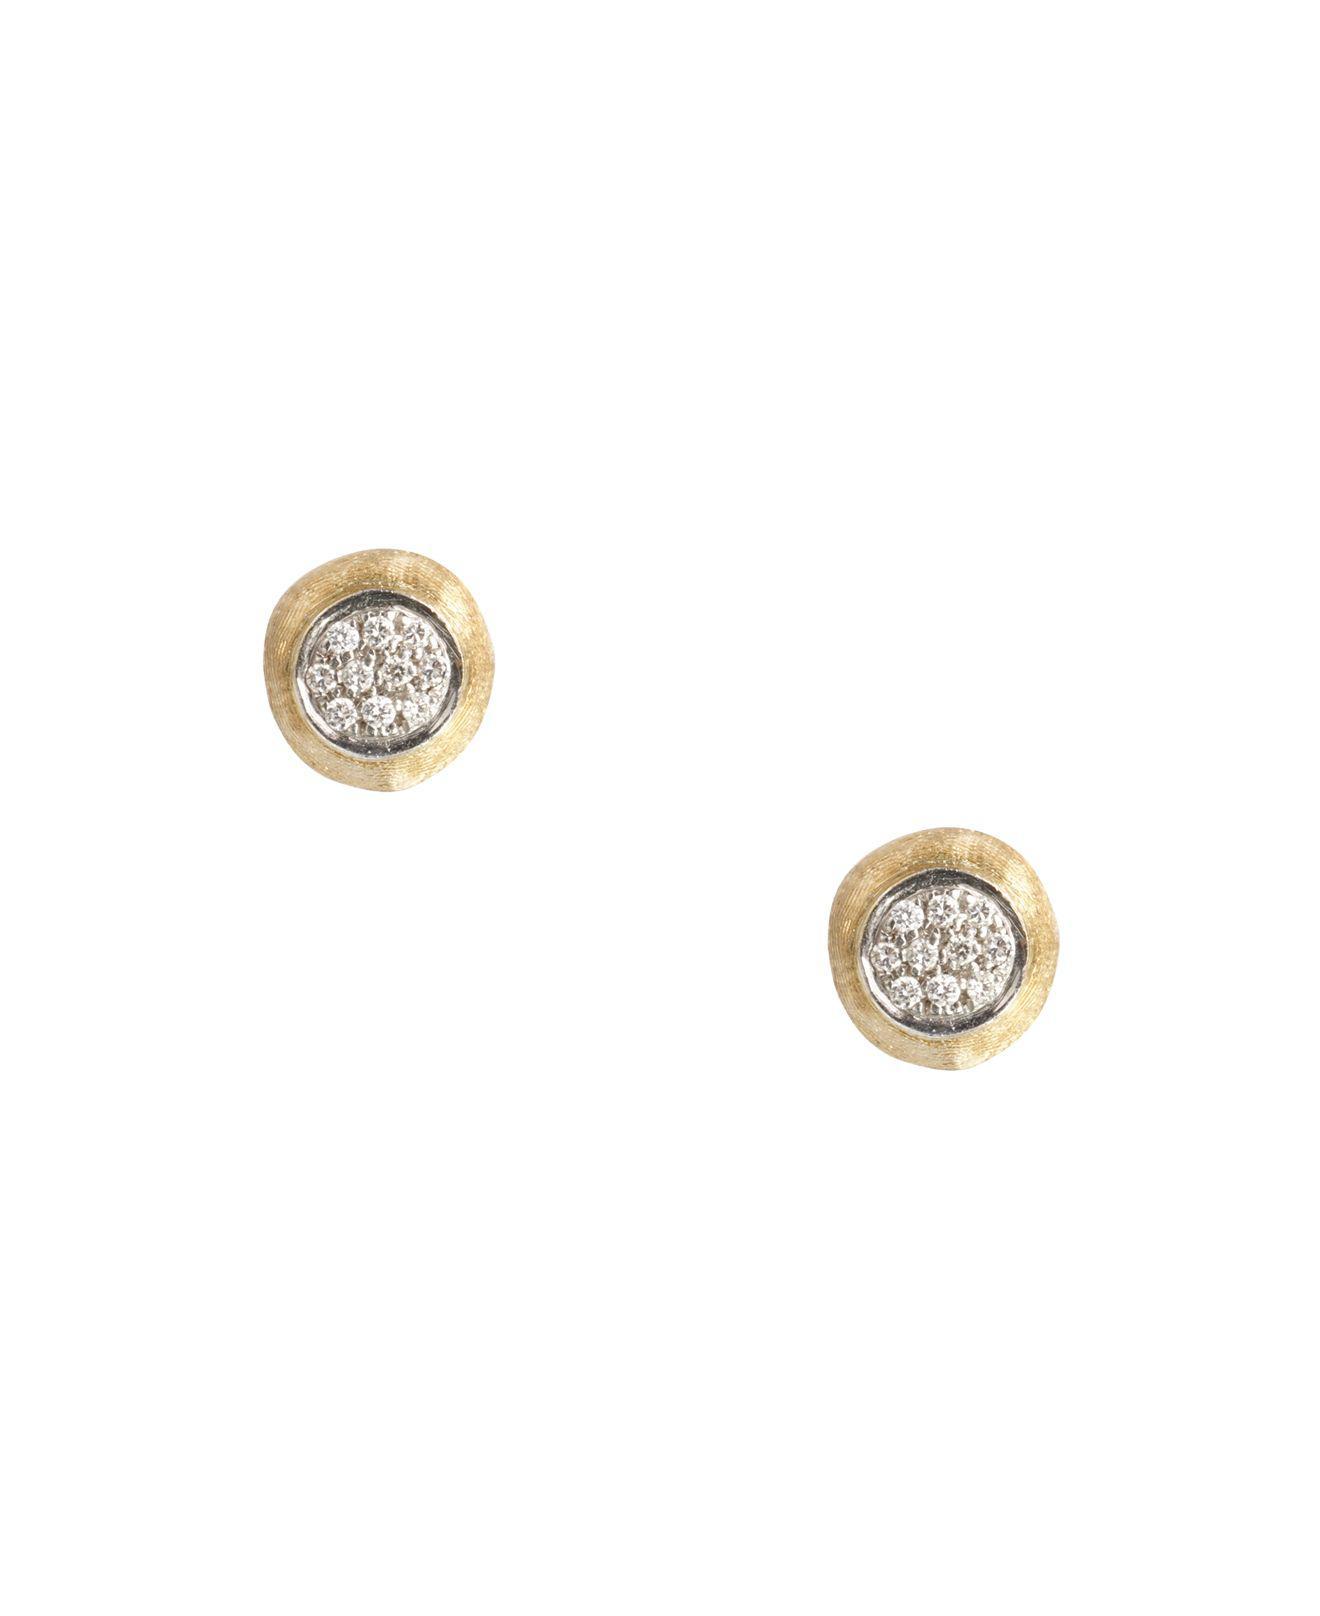 Marco Bicego Delicati 18k Round Drop Earrings w/ Pavé Diamonds K5lghrEQ